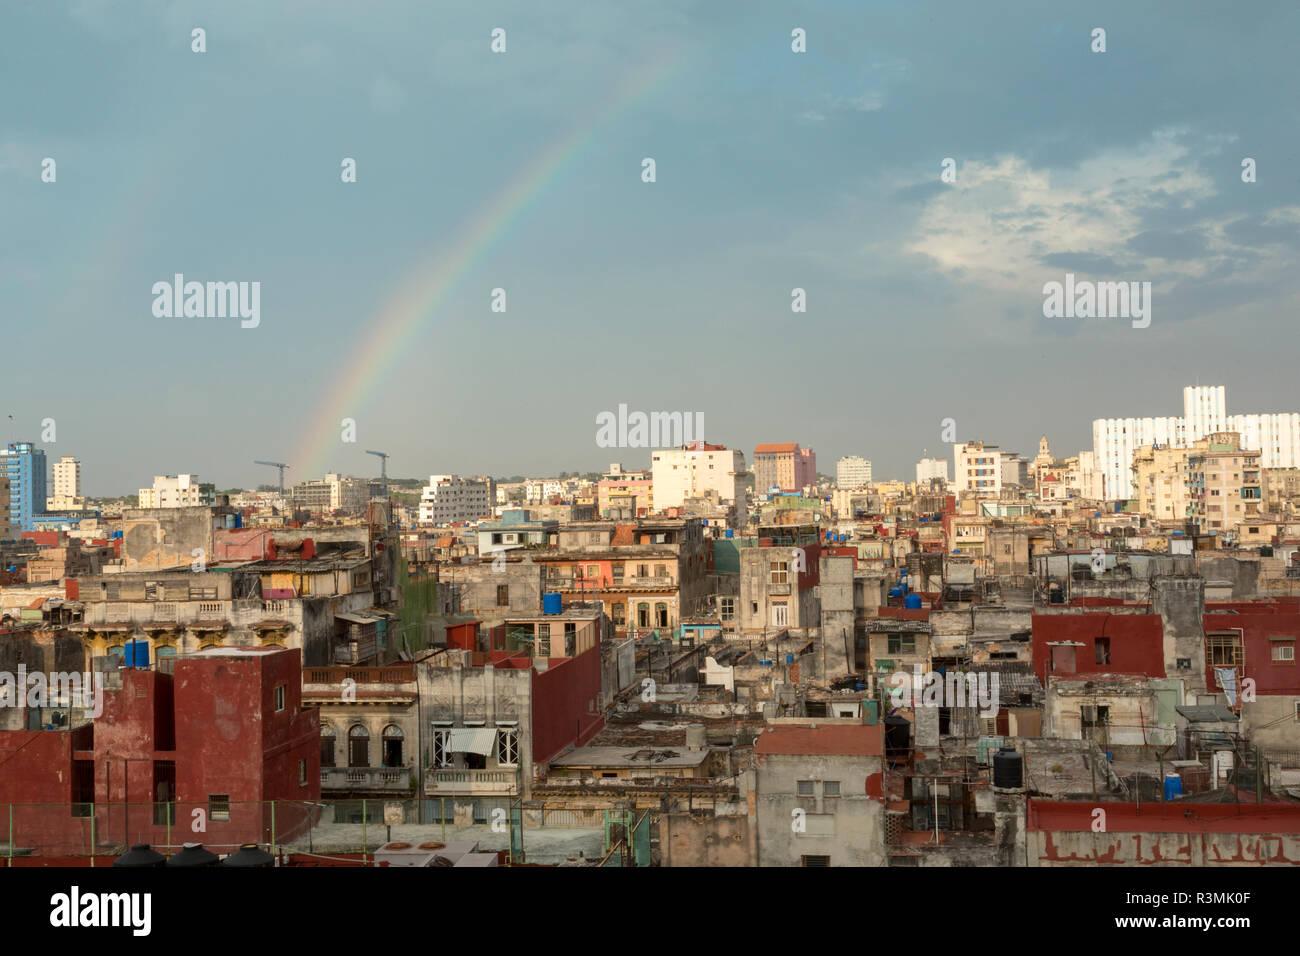 Cuba, Havana. Rainbow over city. Credit as: Wendy Kaveney / Jaynes Gallery / DanitaDelimont.com Stock Photo